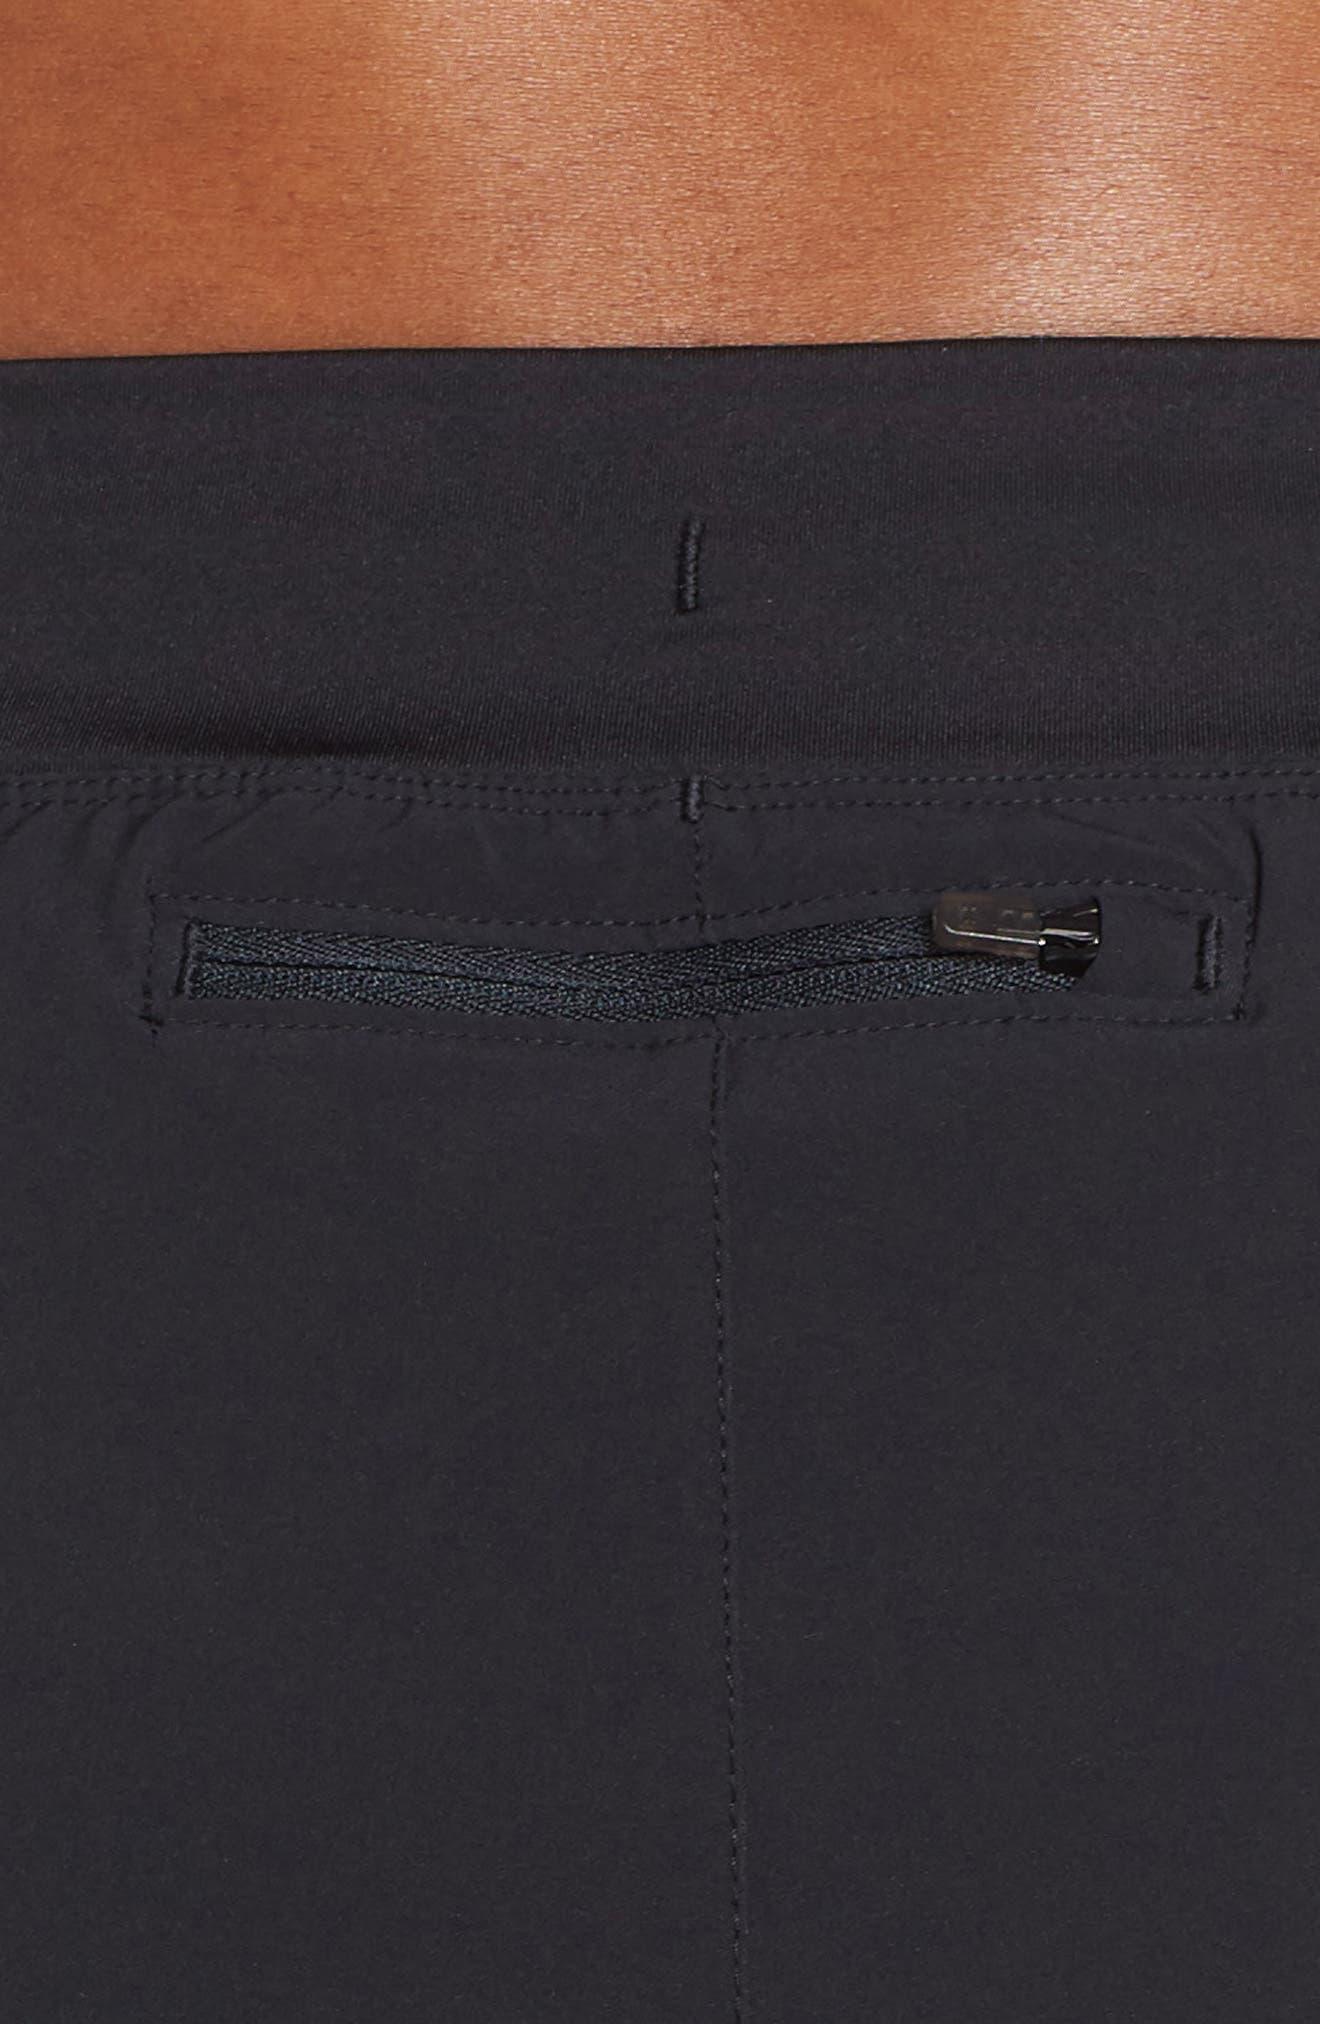 Speedpocket Shorts,                             Alternate thumbnail 4, color,                             BLACK/ BLACK/ REFLECTIVE